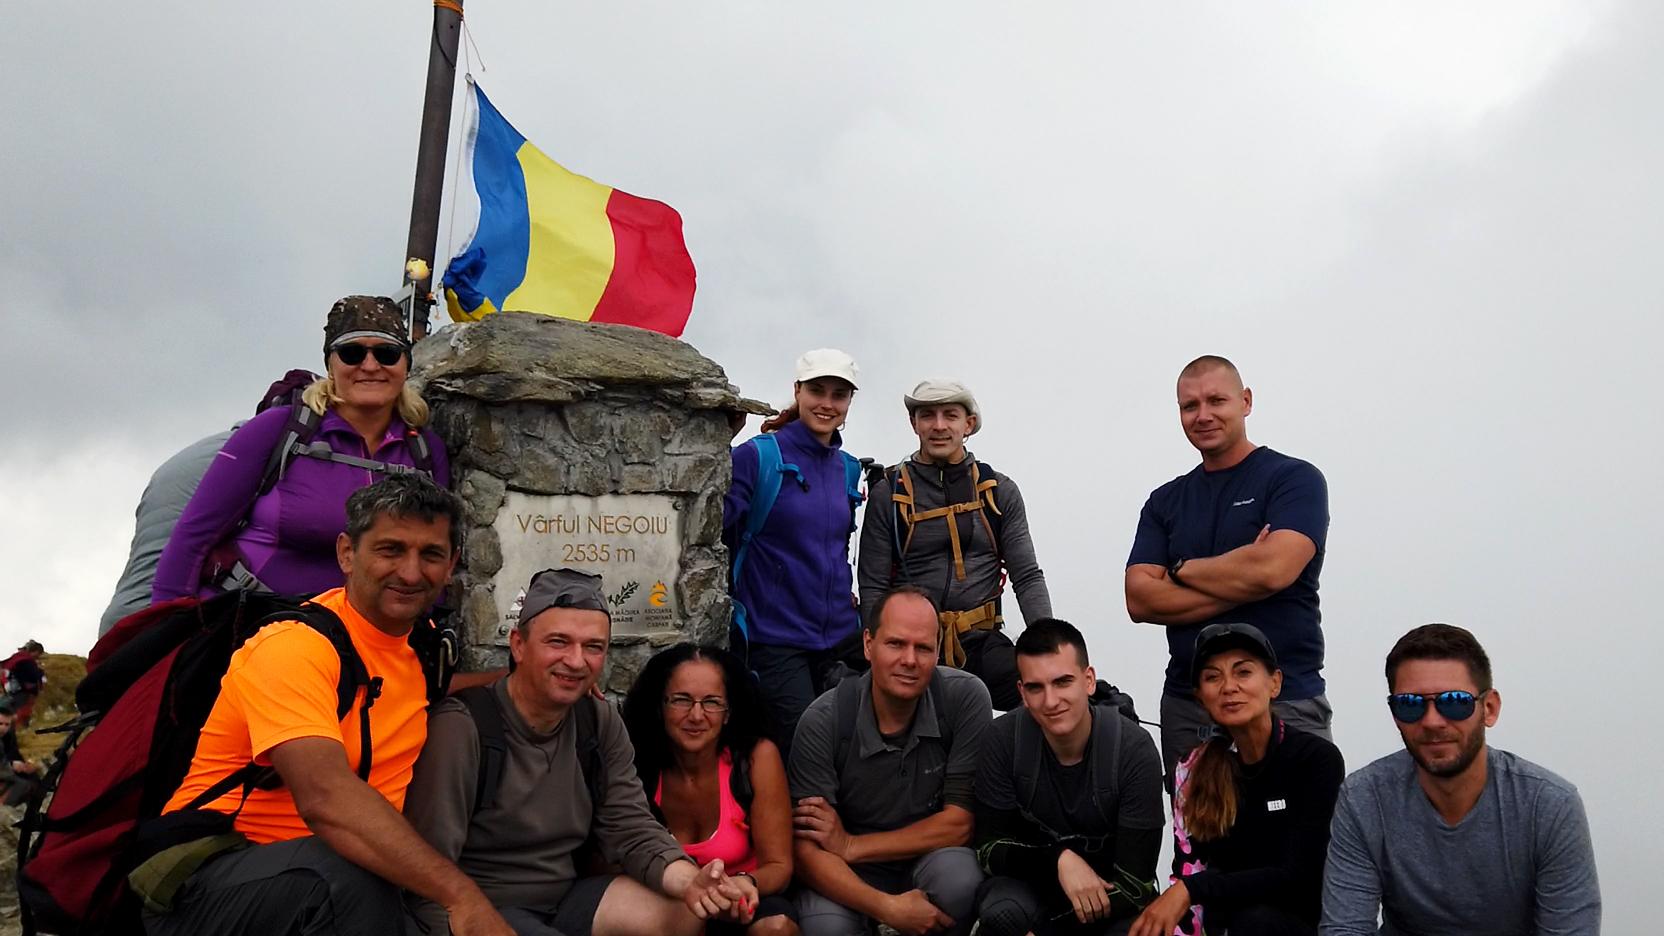 A Negoj csúcs (Vârful Negoiu 2535 m)